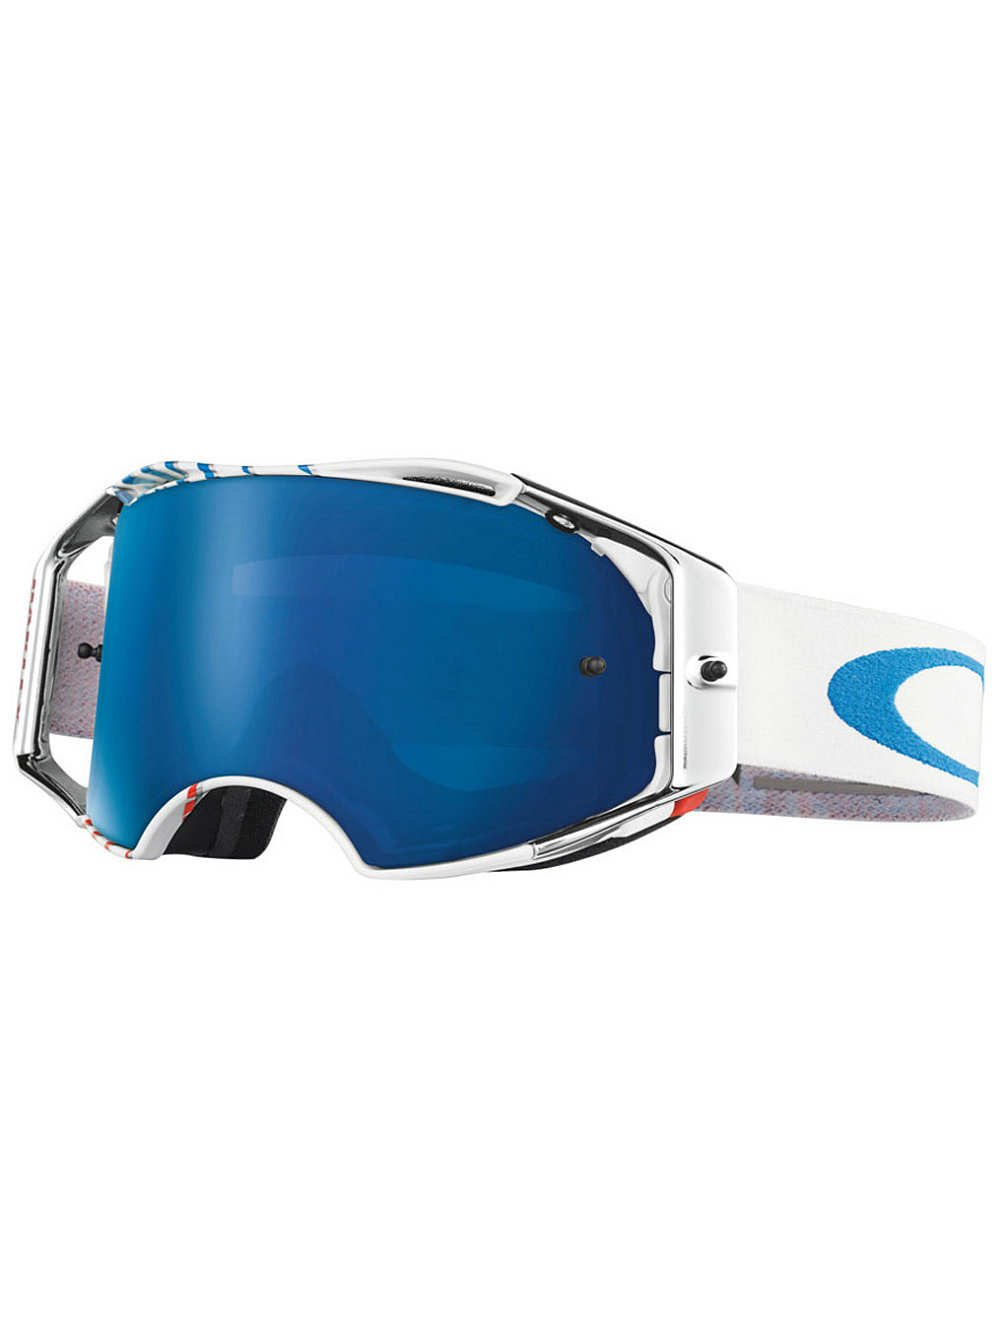 Oakley Airbrake MX Men's Goggles (RV High Octane RWB Frame/Black Ice Iridium Lens)